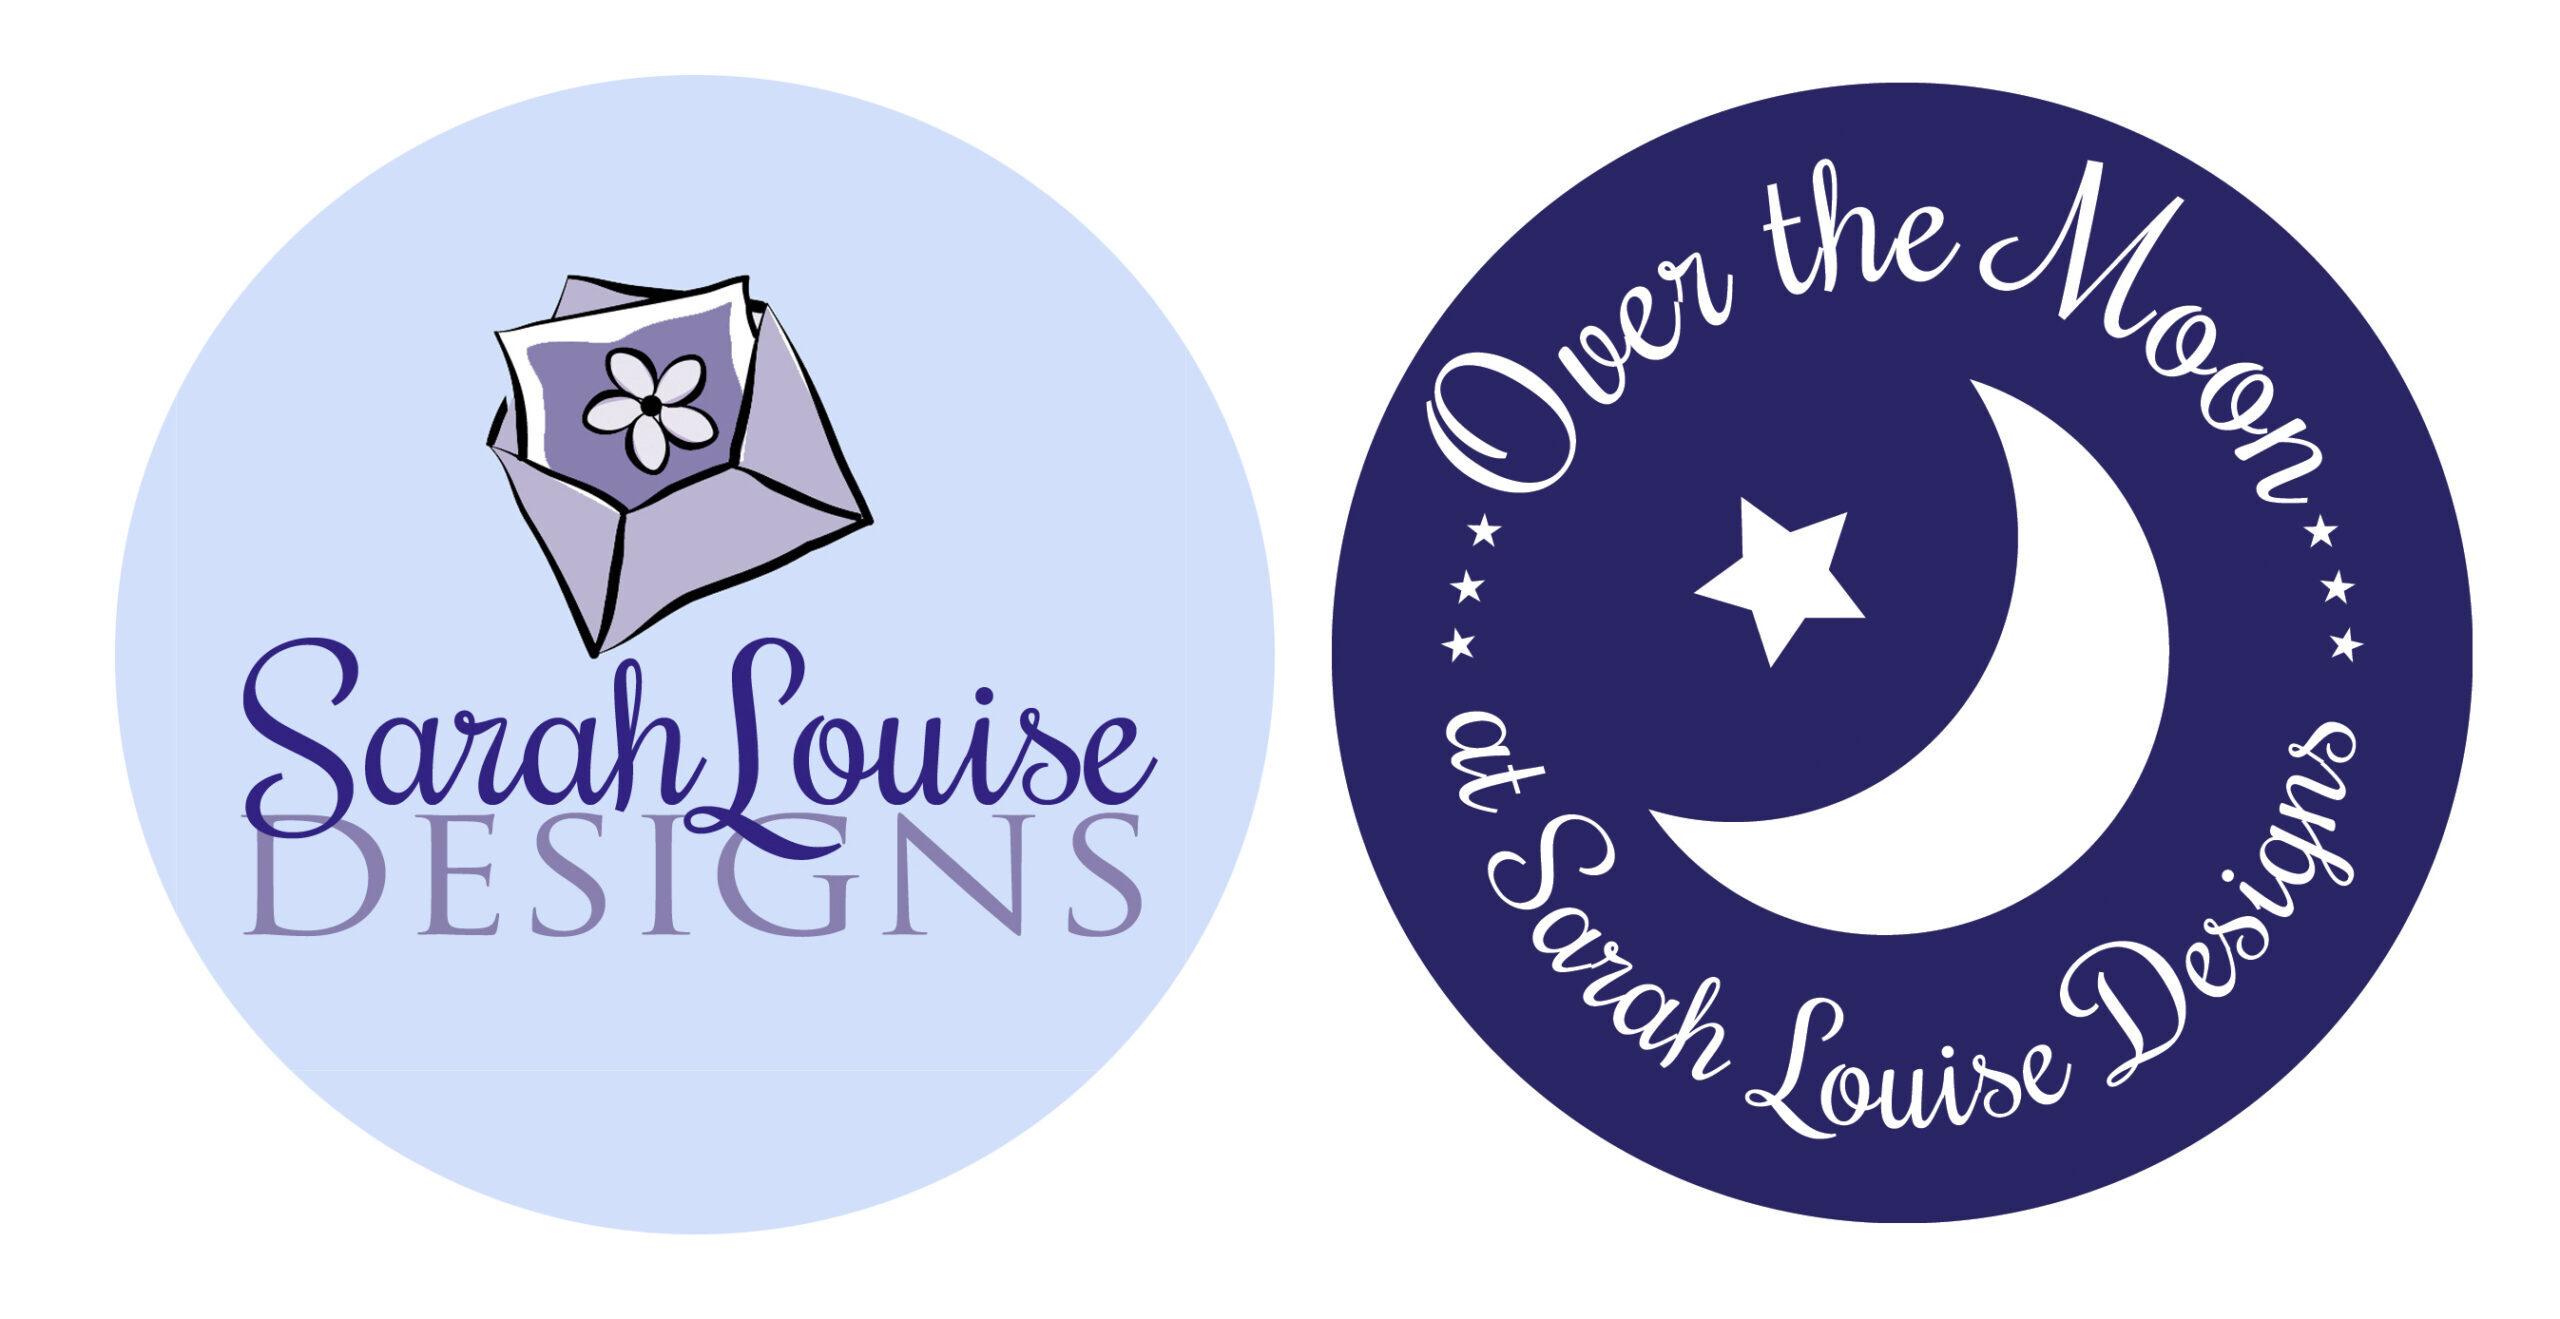 Sarah Louise Designs